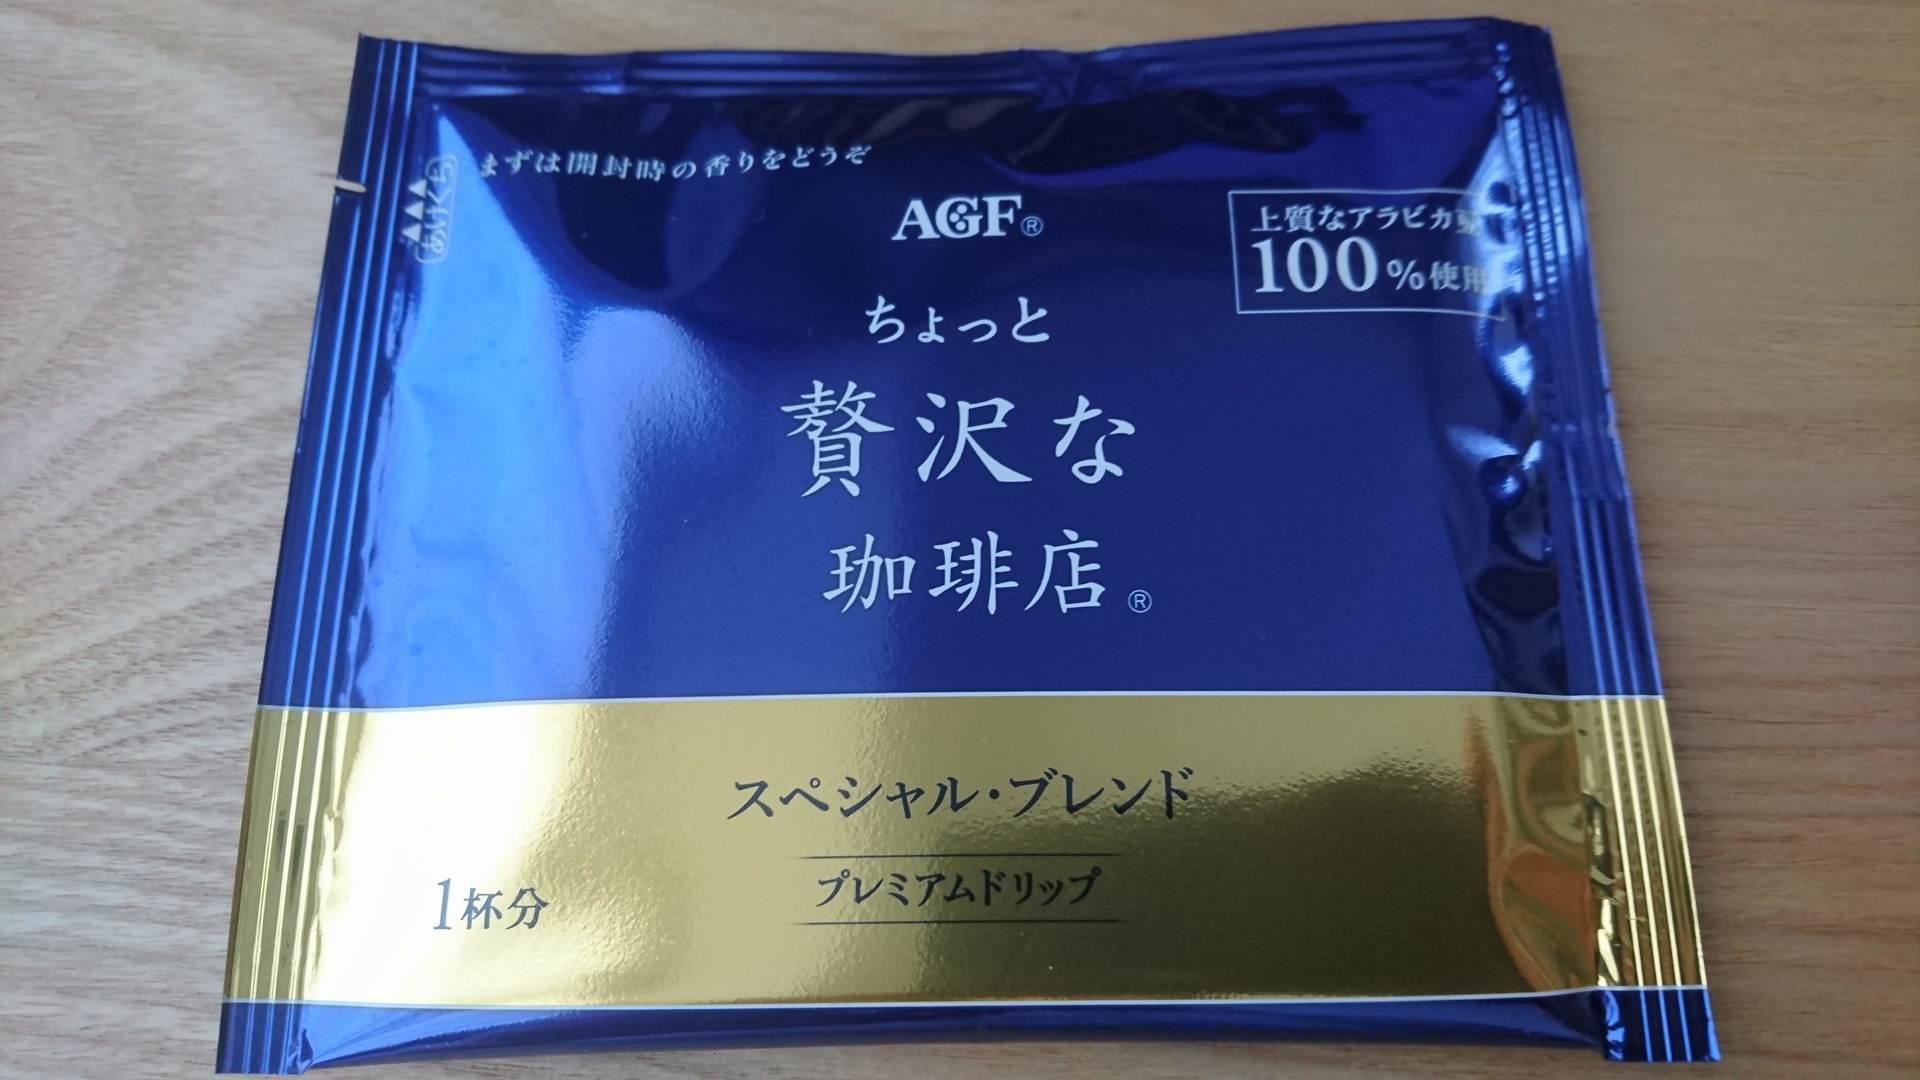 DSC_6683.JPG